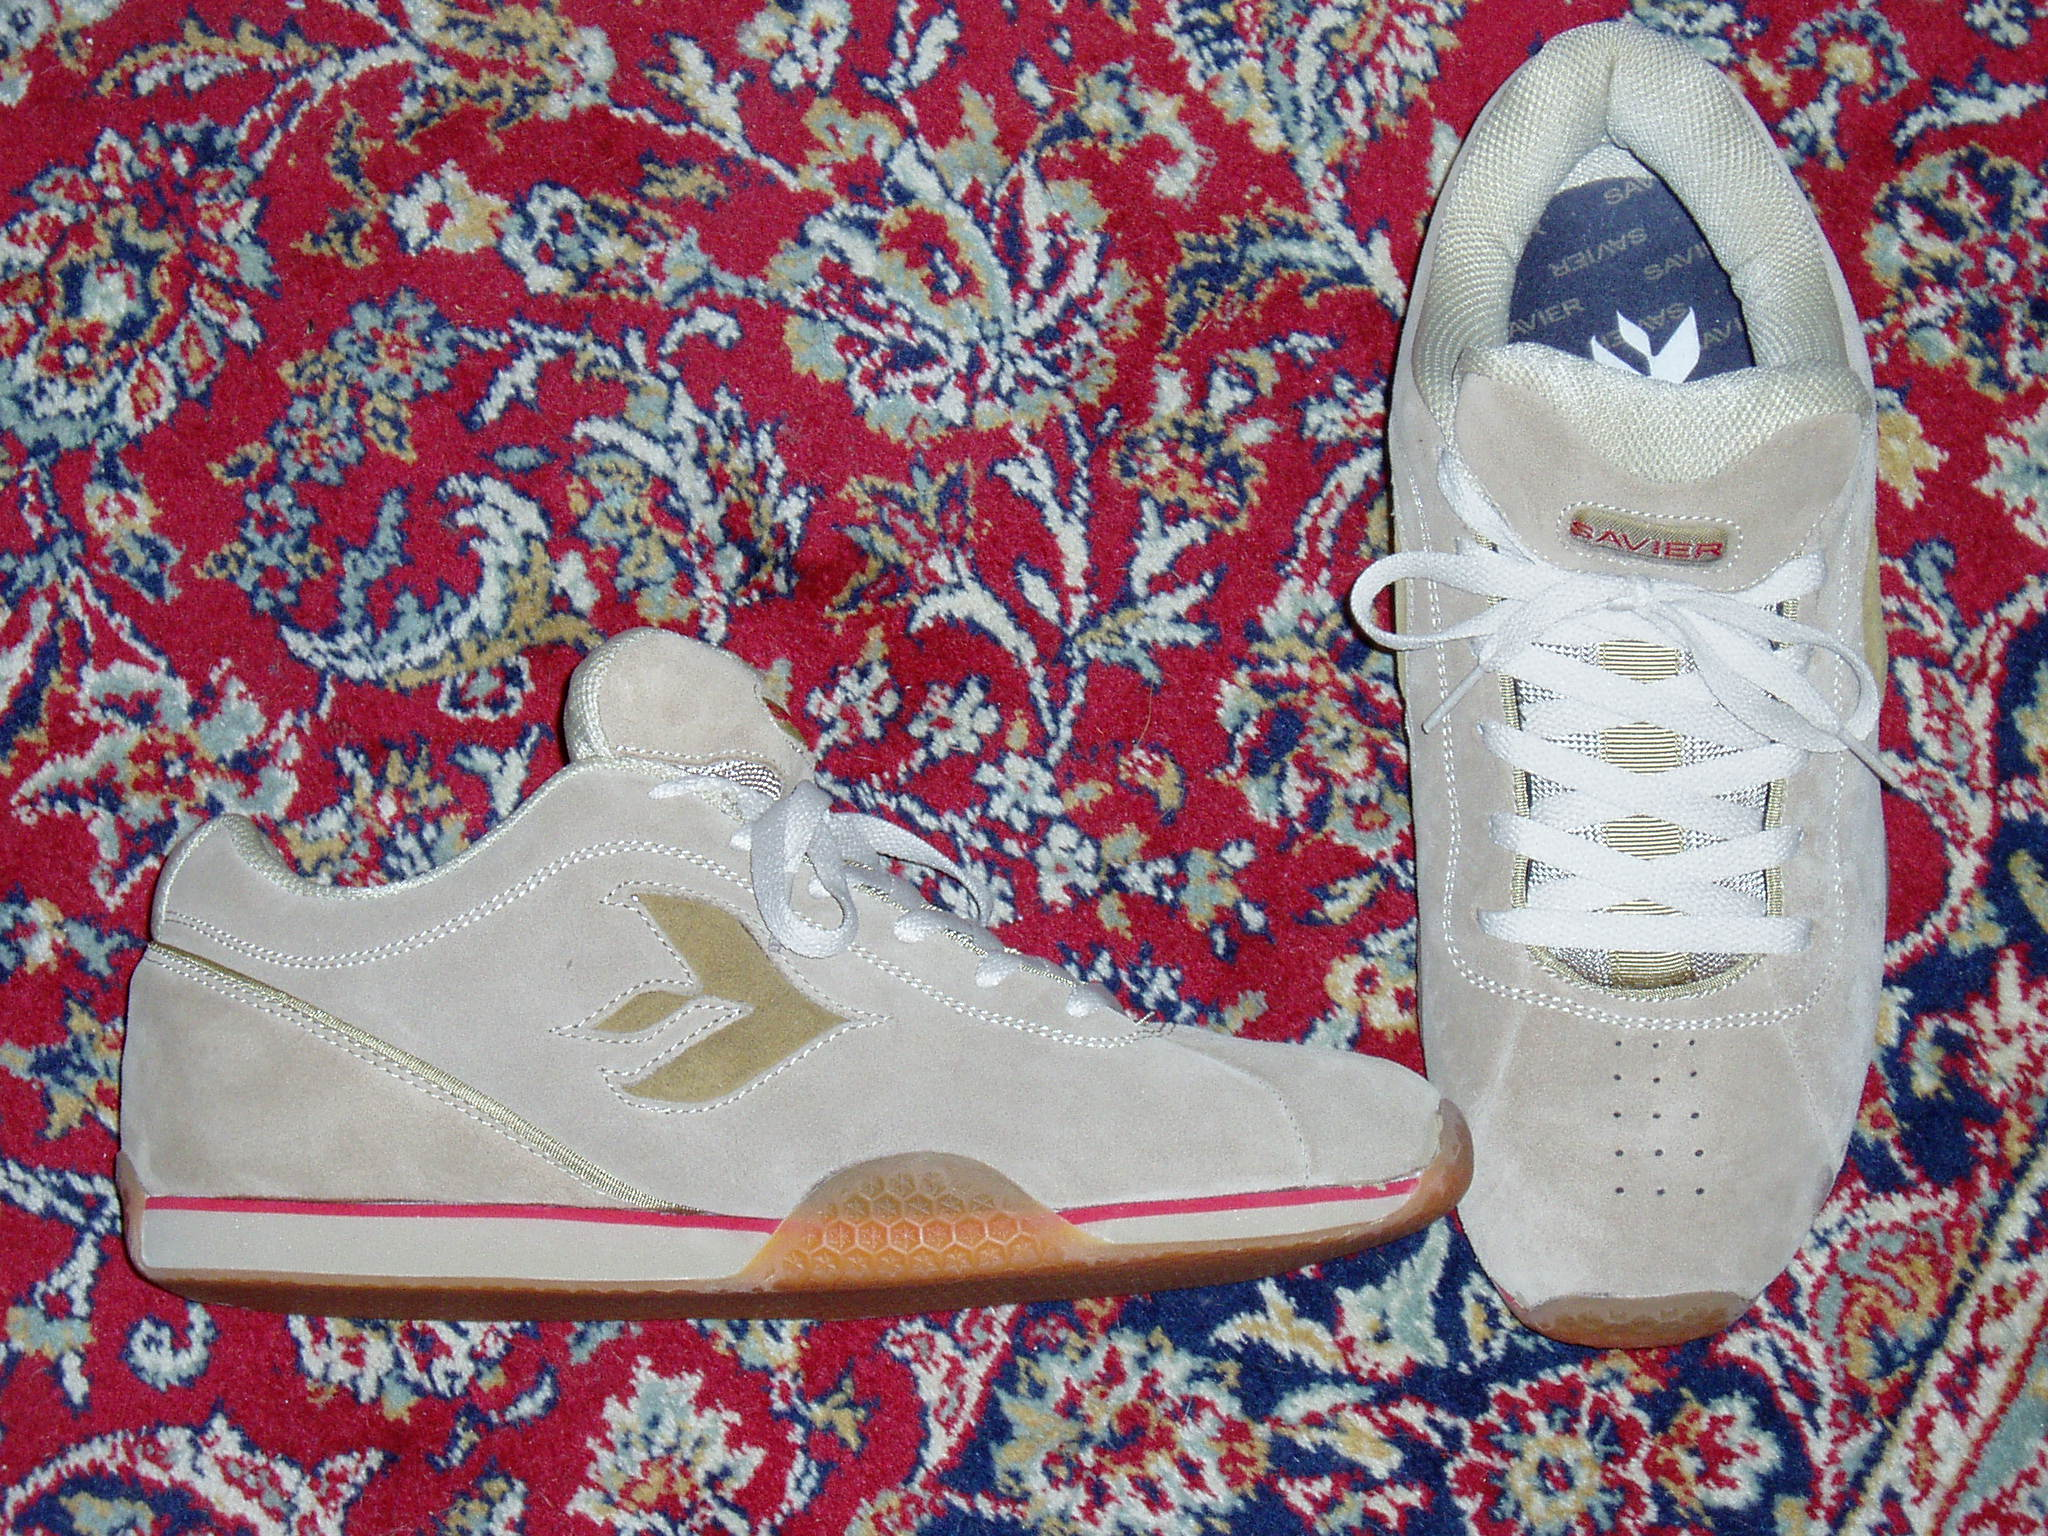 My Savier Cooper sneakers